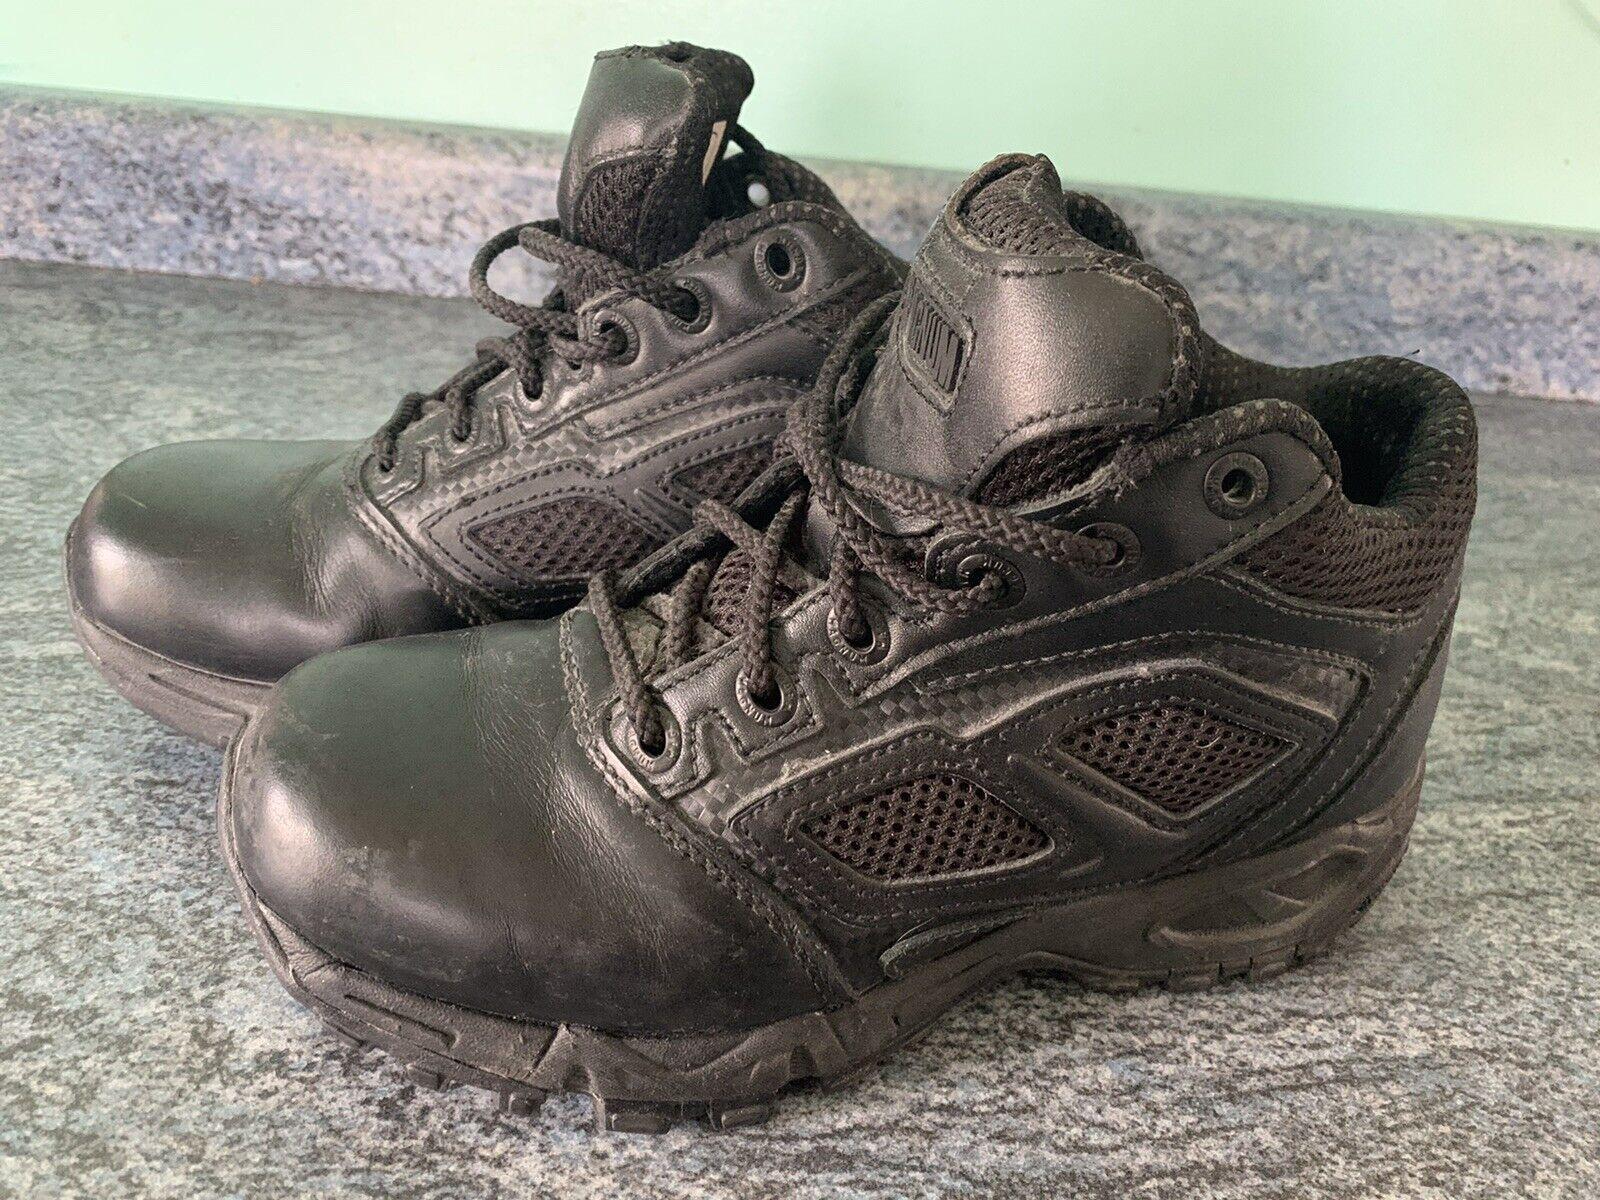 Magnum Elite Spider 5.0 Black Leather / Nylon Uniform Police Boots /Trainer UK 3